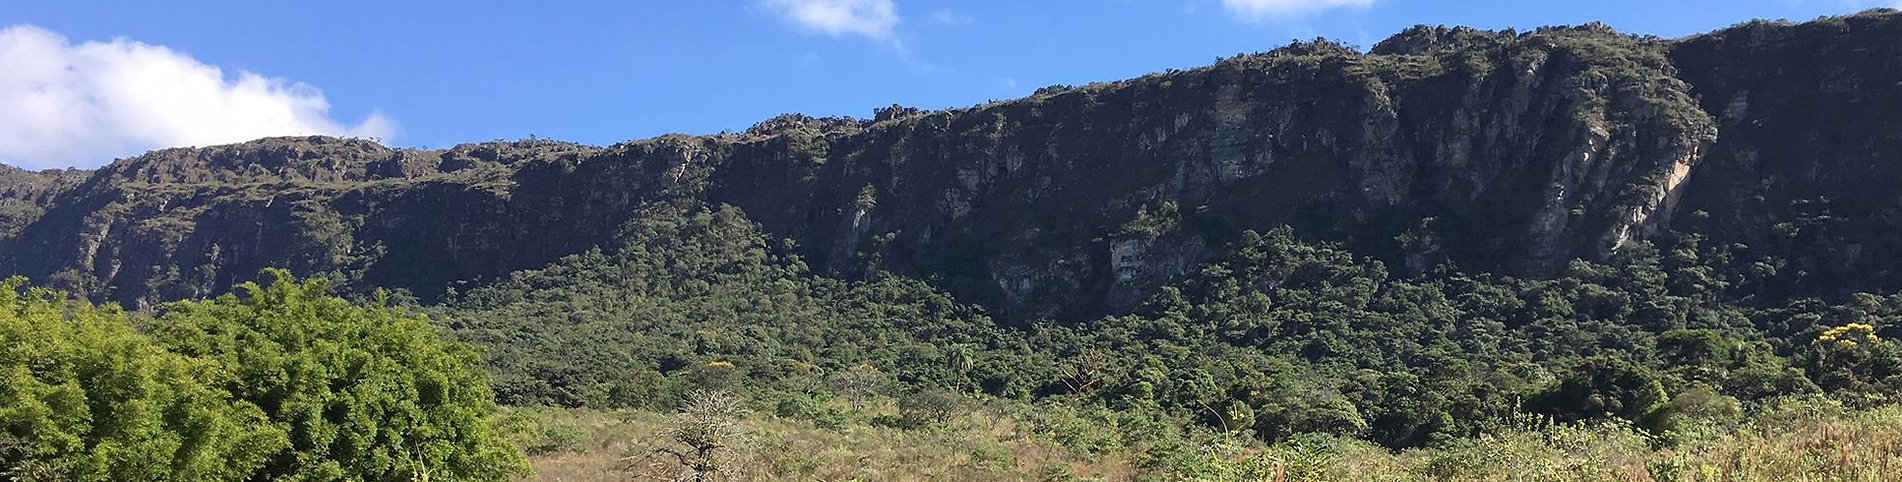 minas gerais - region der grünen propolis